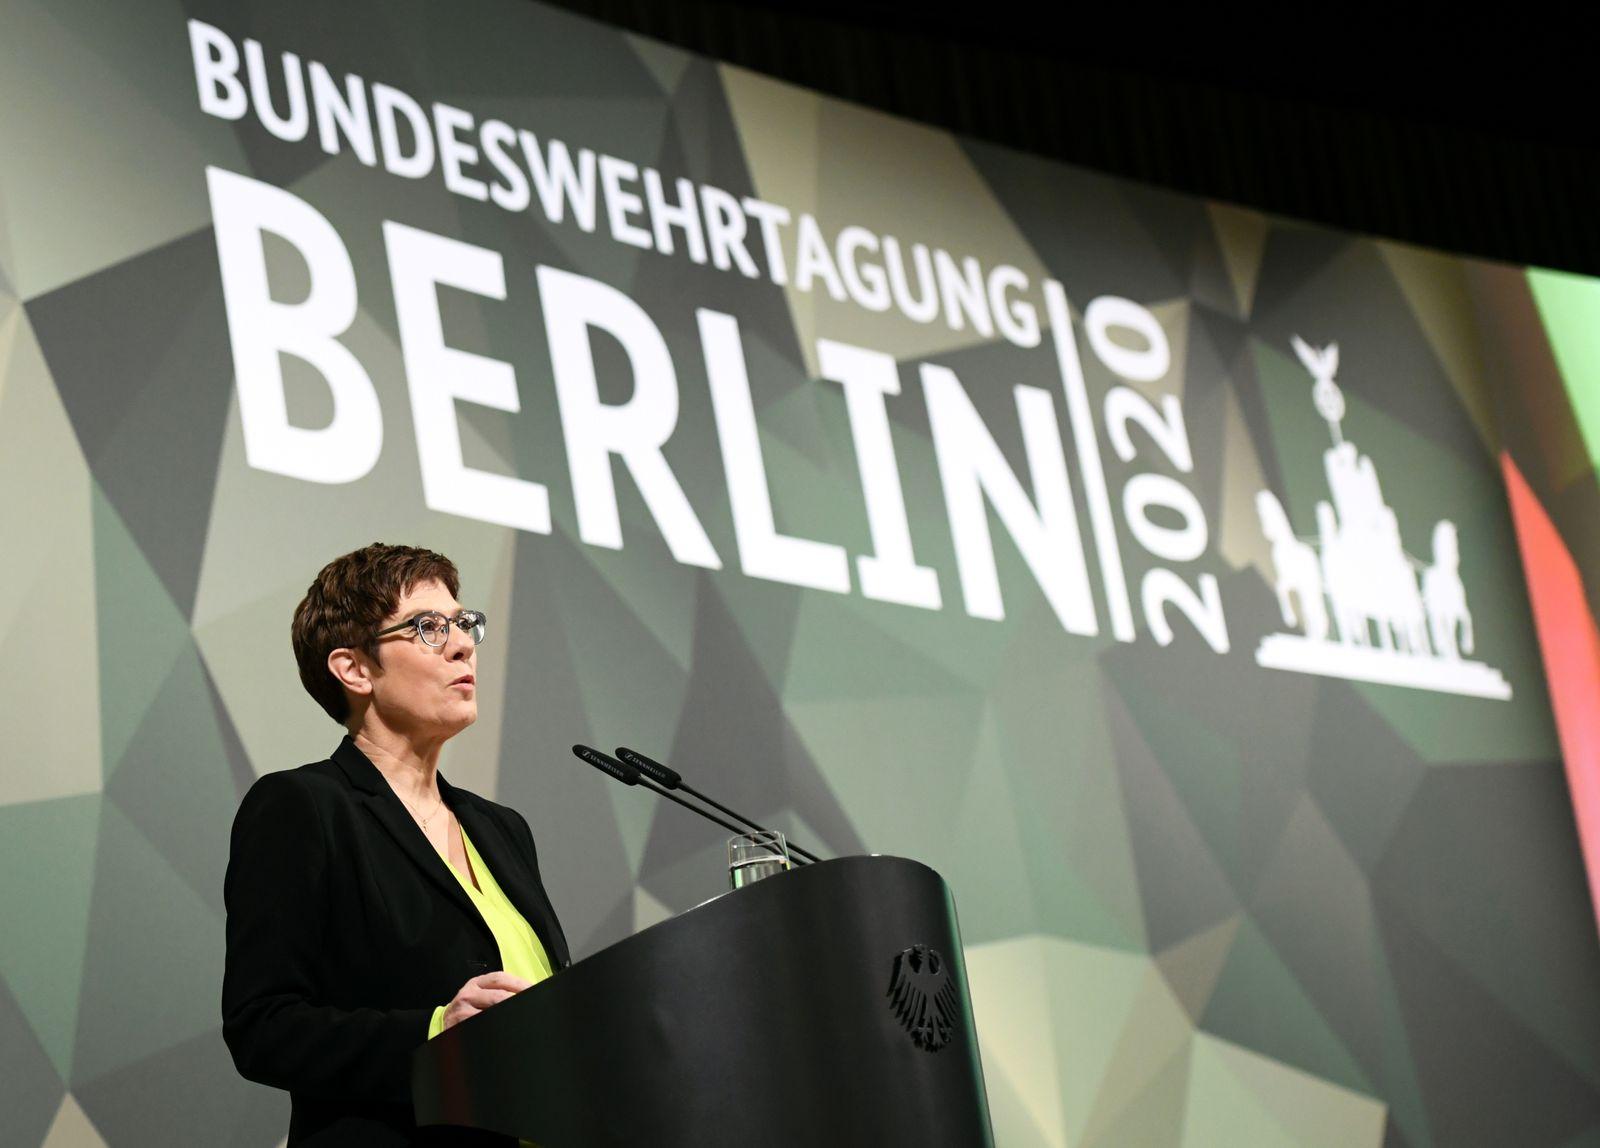 Germany's Defense Minister Annegret Kramp-Karrenbauer attends the Bundeswehr congress in Berlin